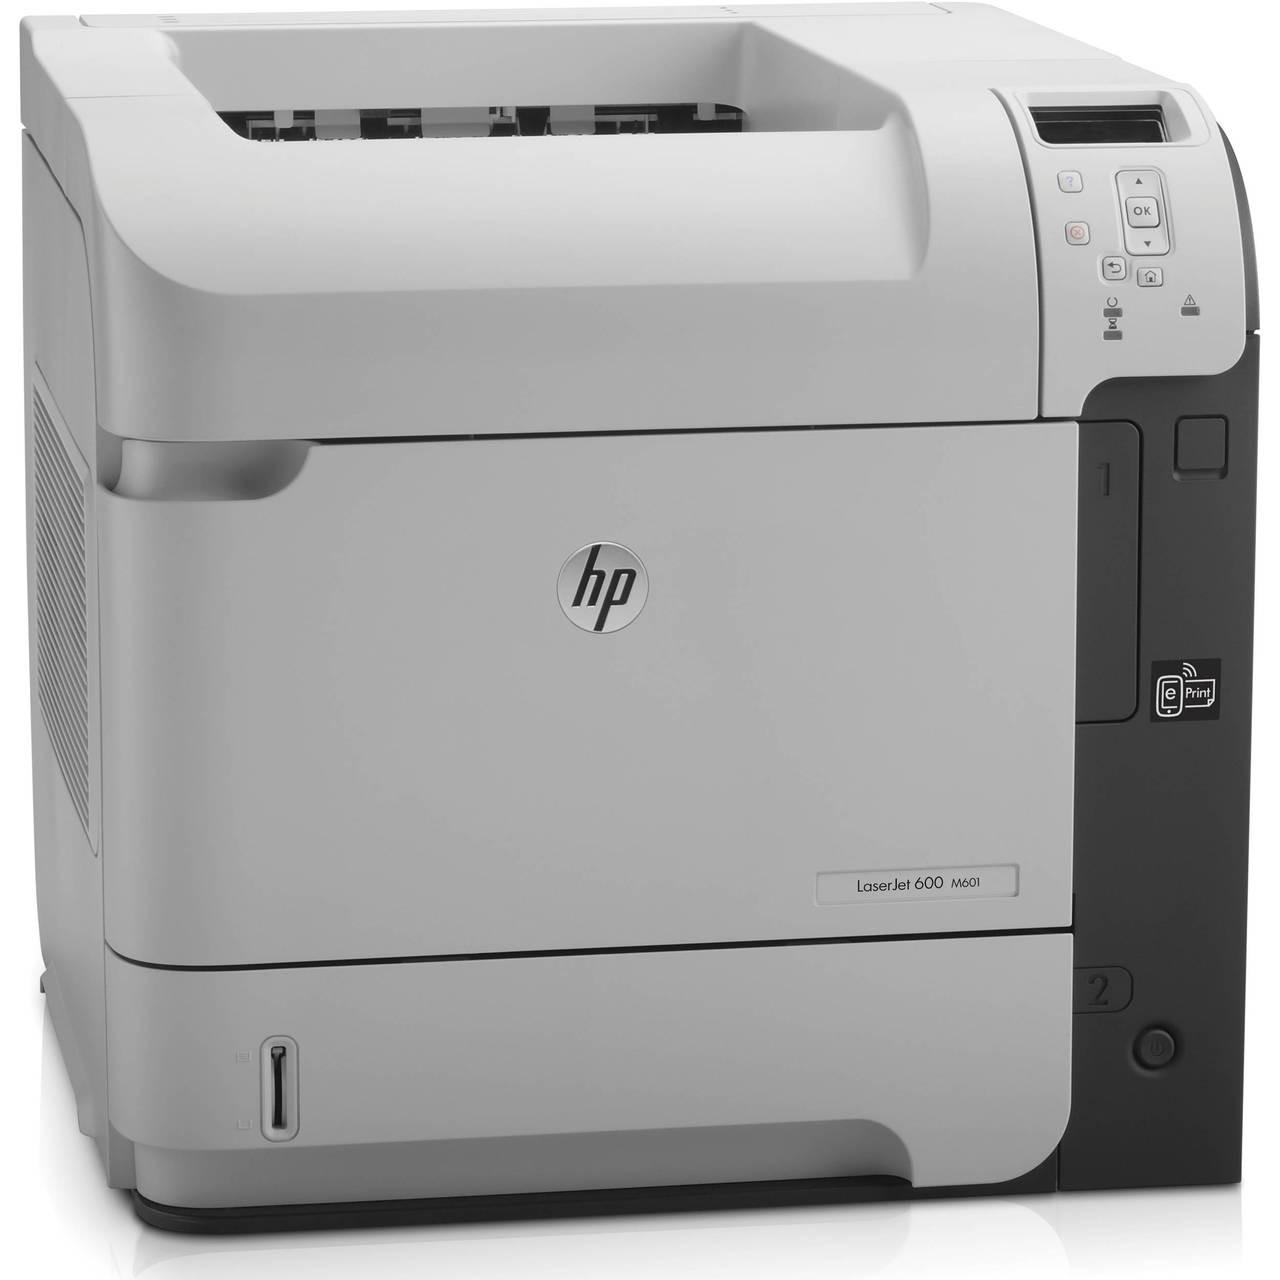 HP LaserJet 600 m601dn - ce990a - HP Laser Printer for sale